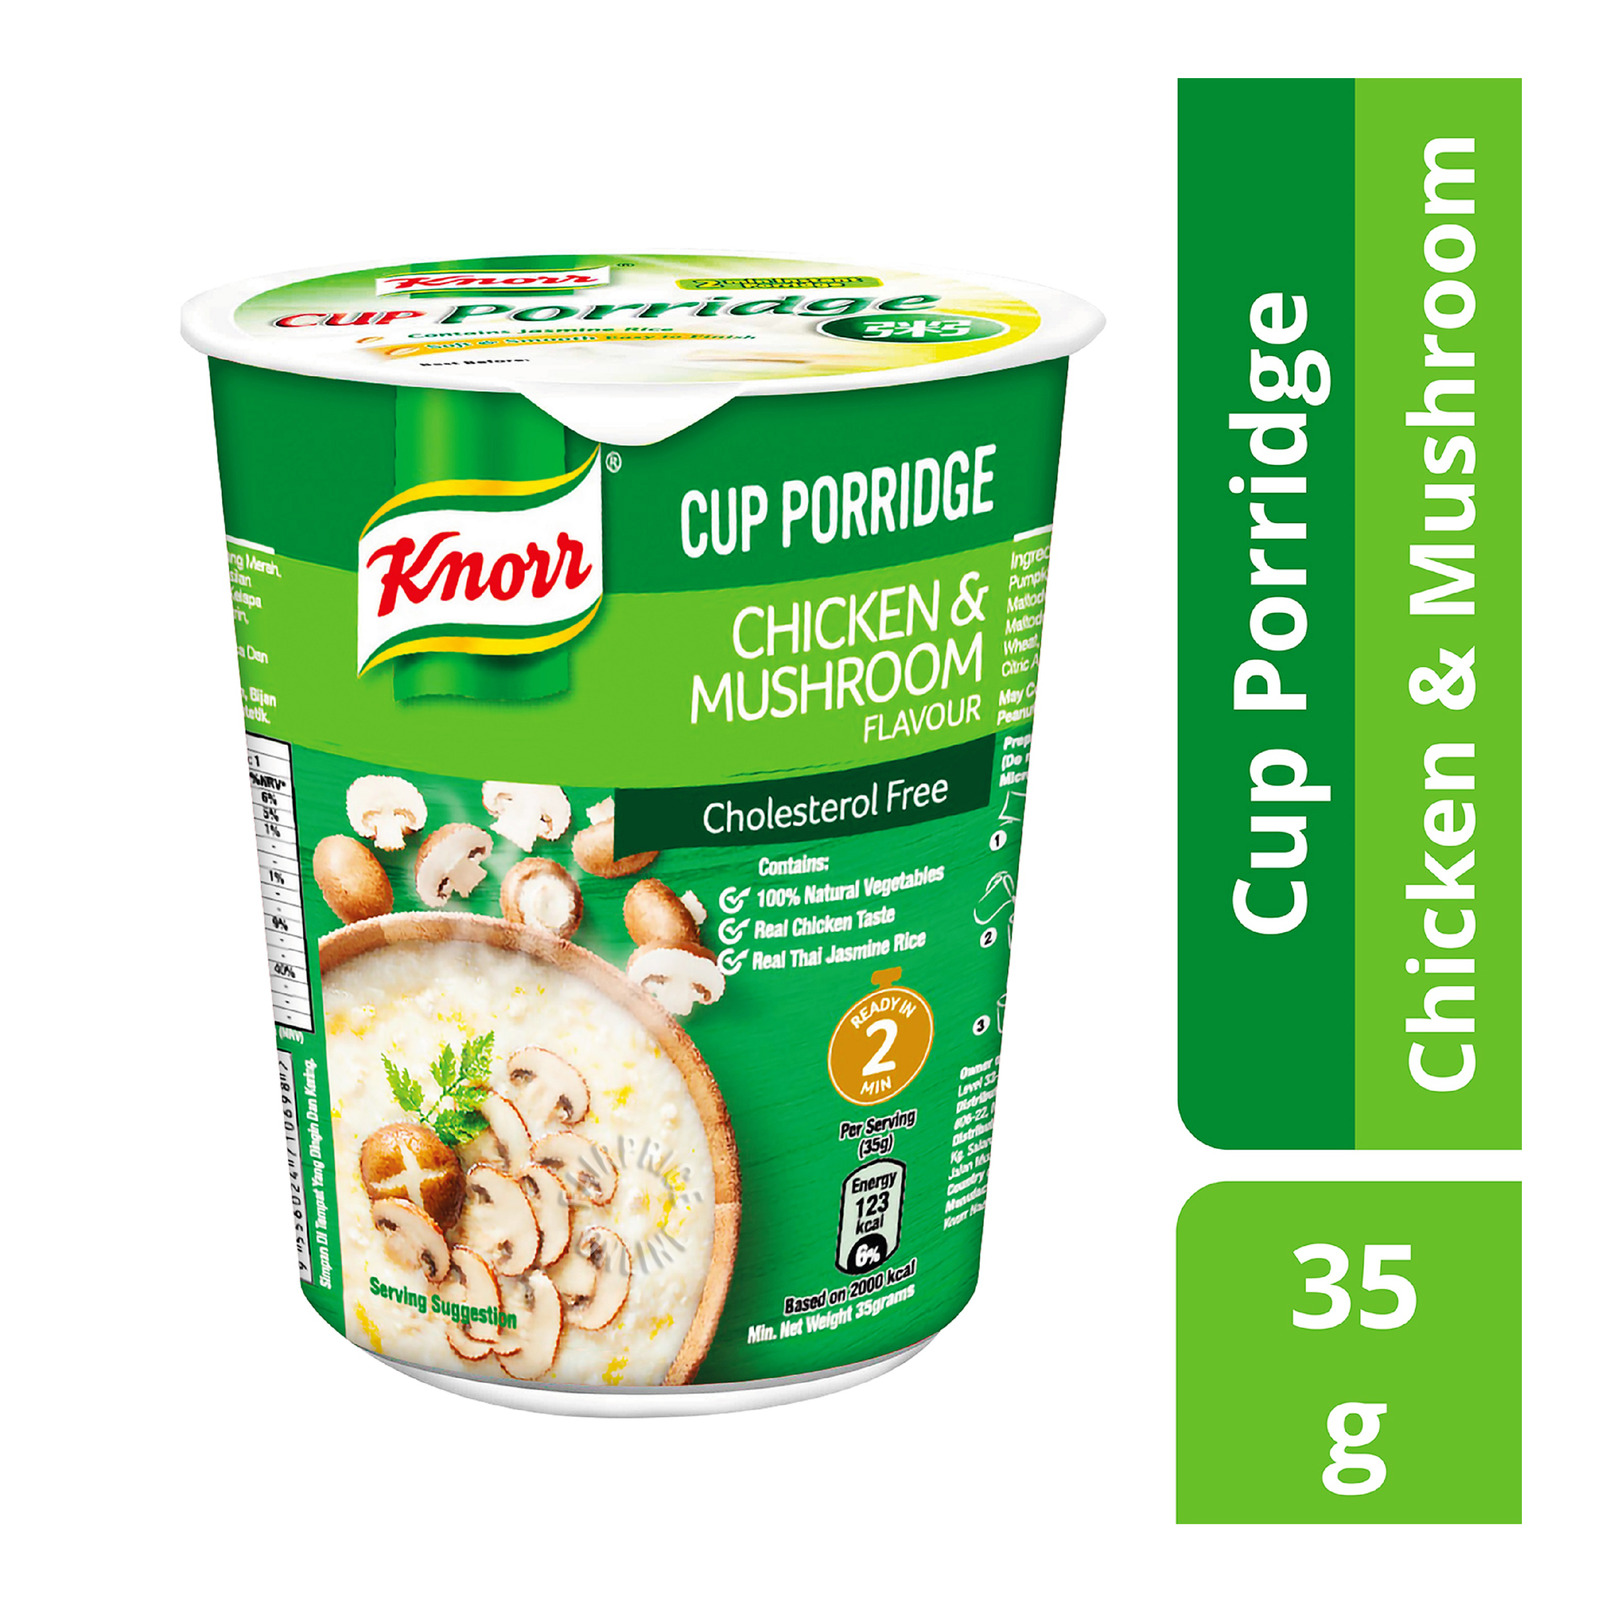 Knorr Instant Cup Porridge - Chicken & Mushroom